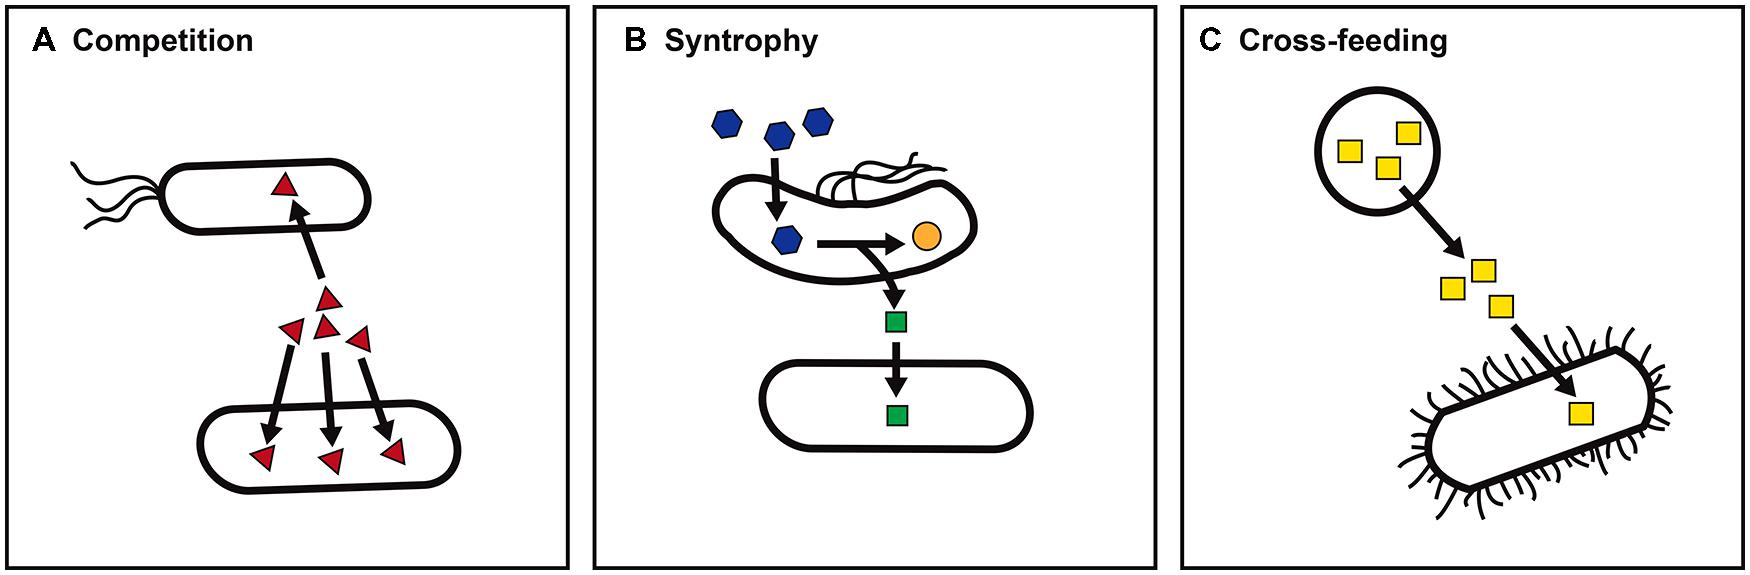 propionate gut bacteria